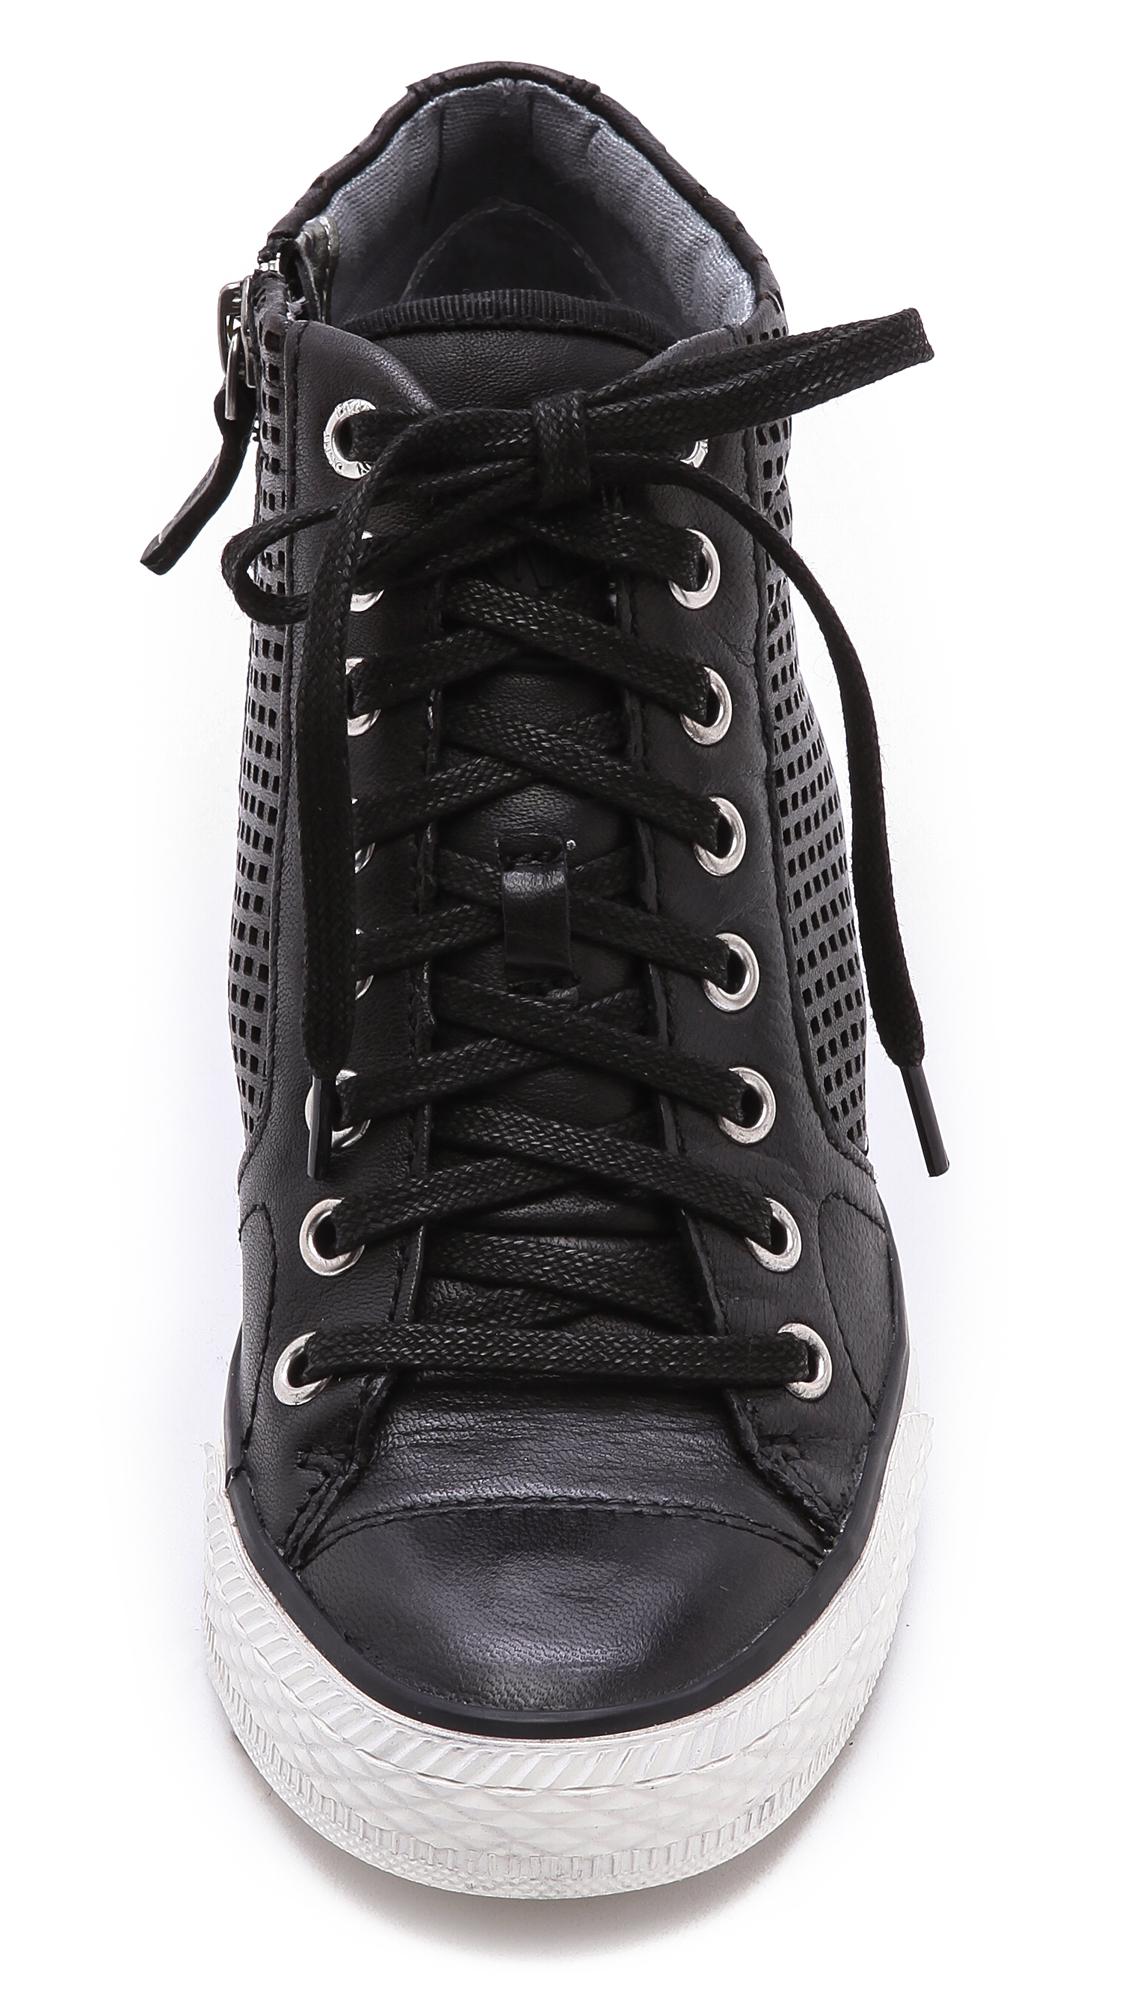 6be7e7b679d2 Lyst - DKNY Cindy Perf Wedge Sneakers in Black